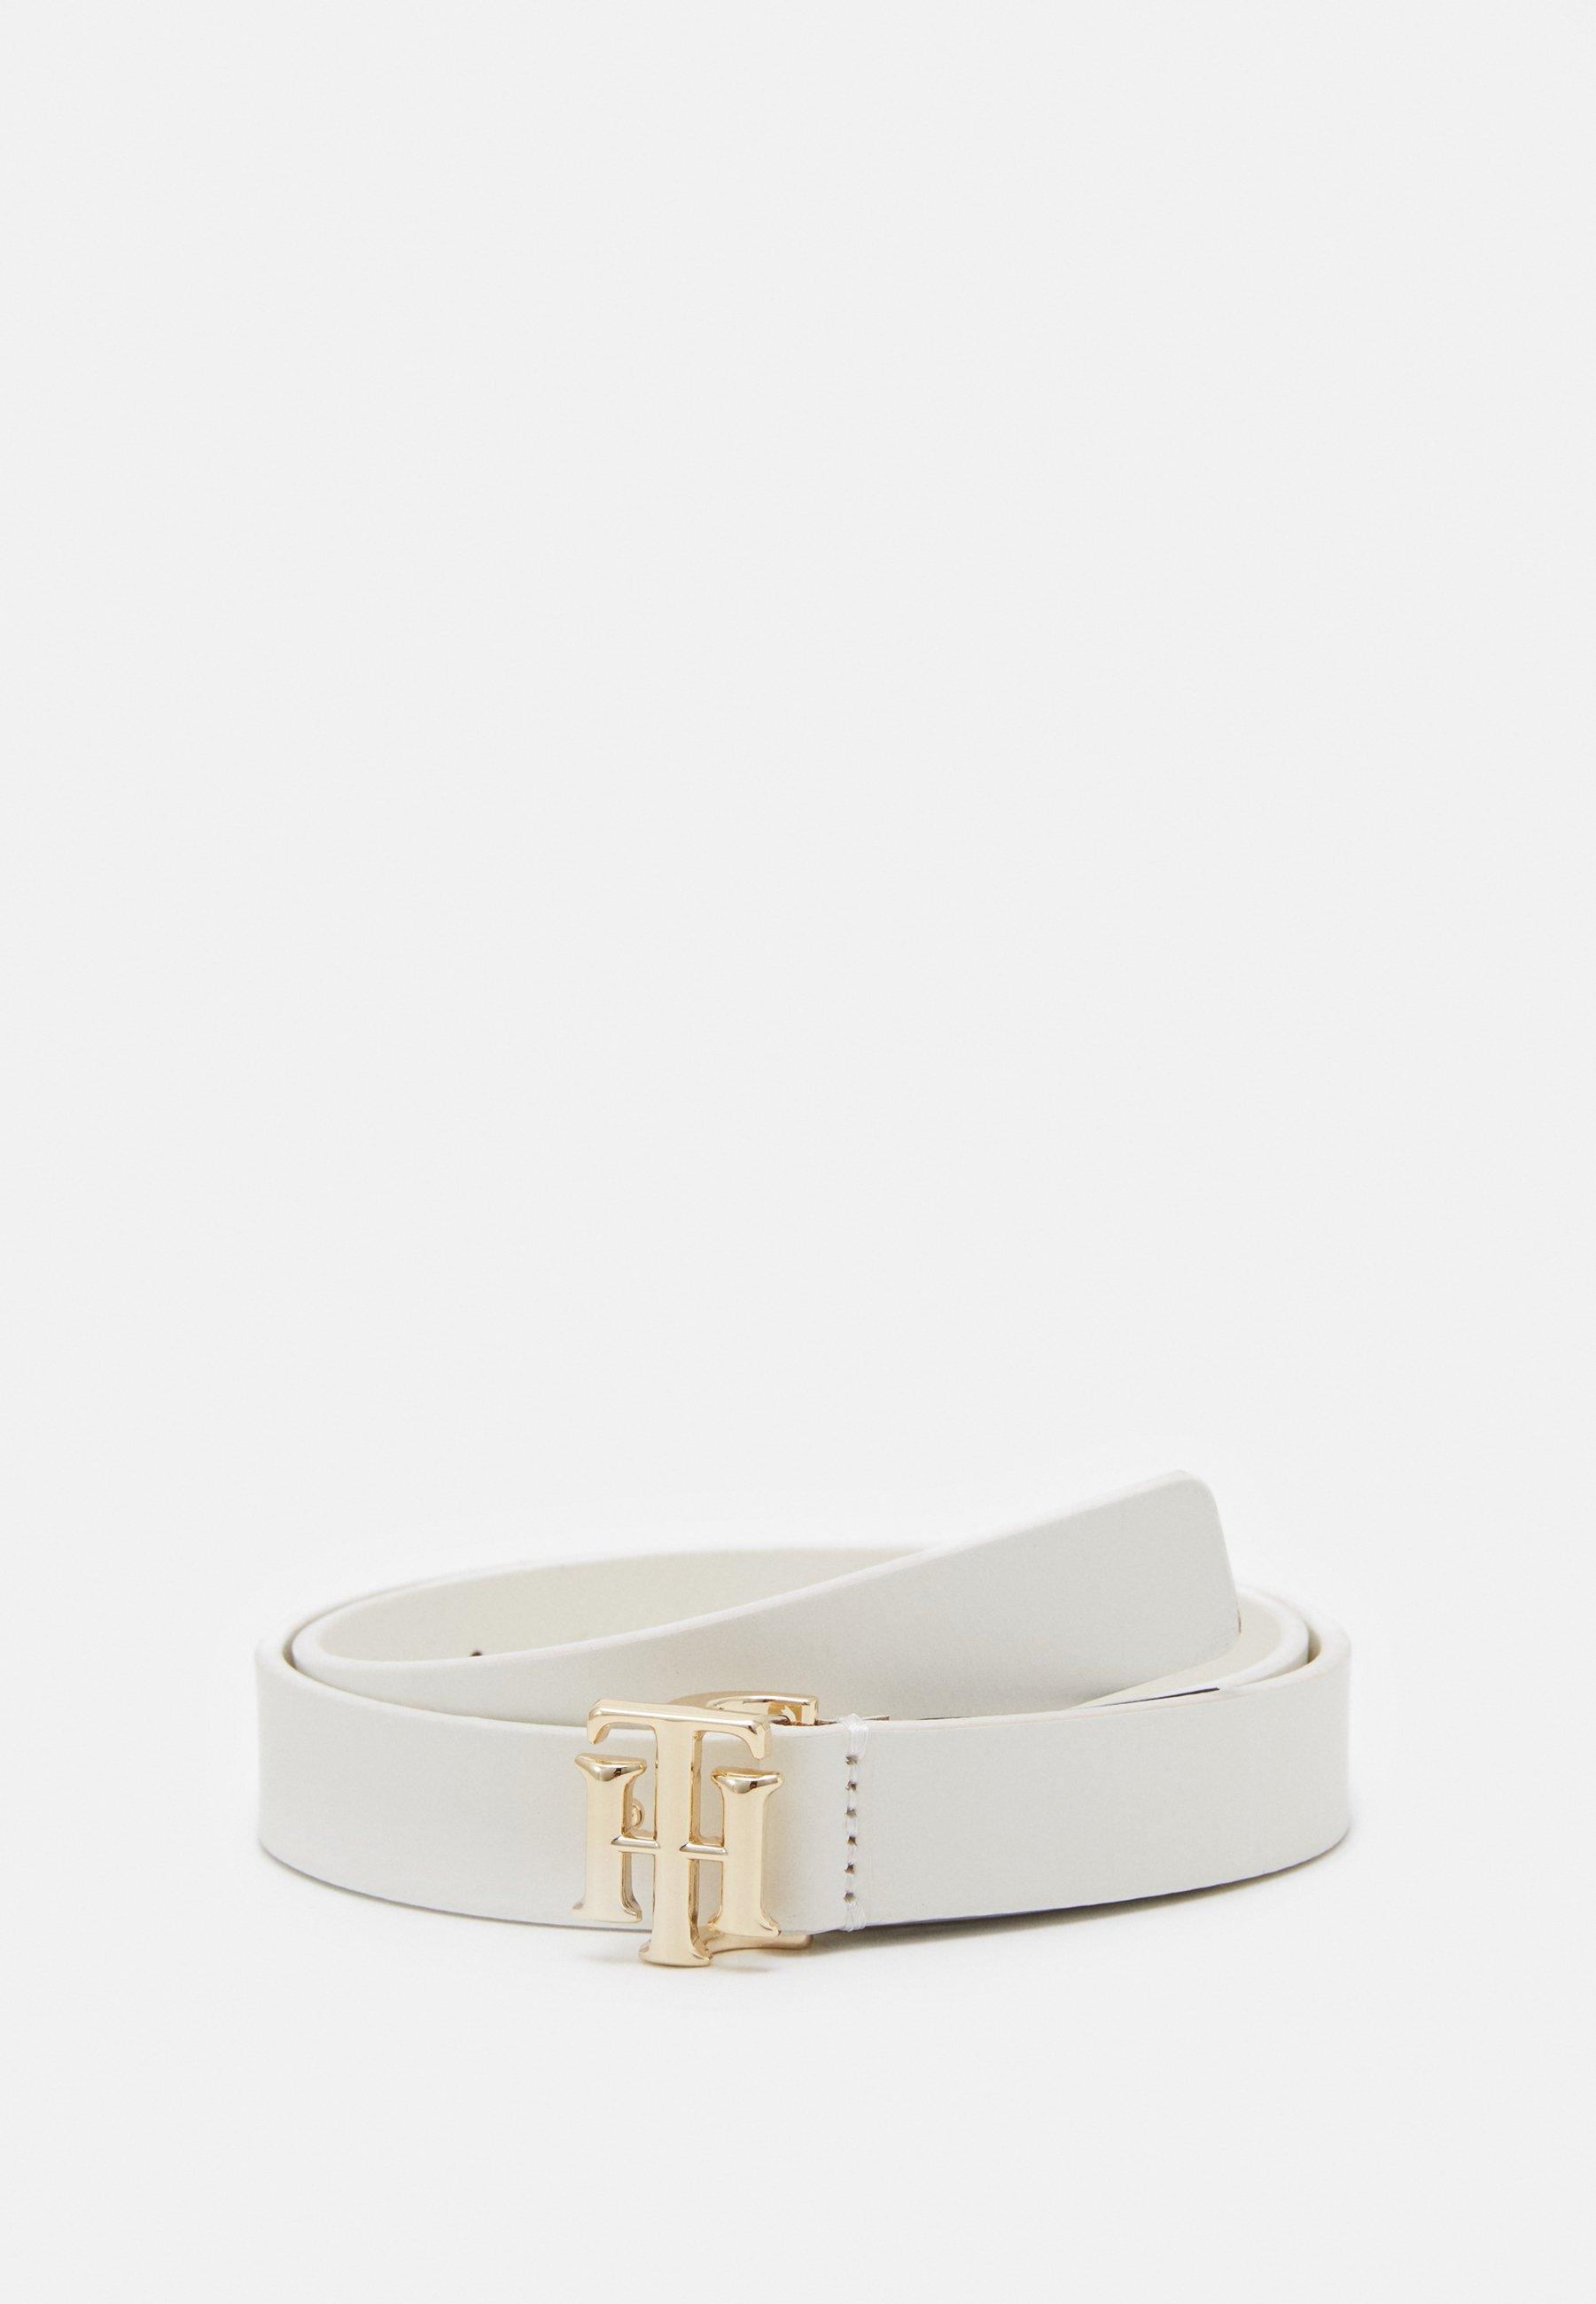 LOGO BELT Waist belt white